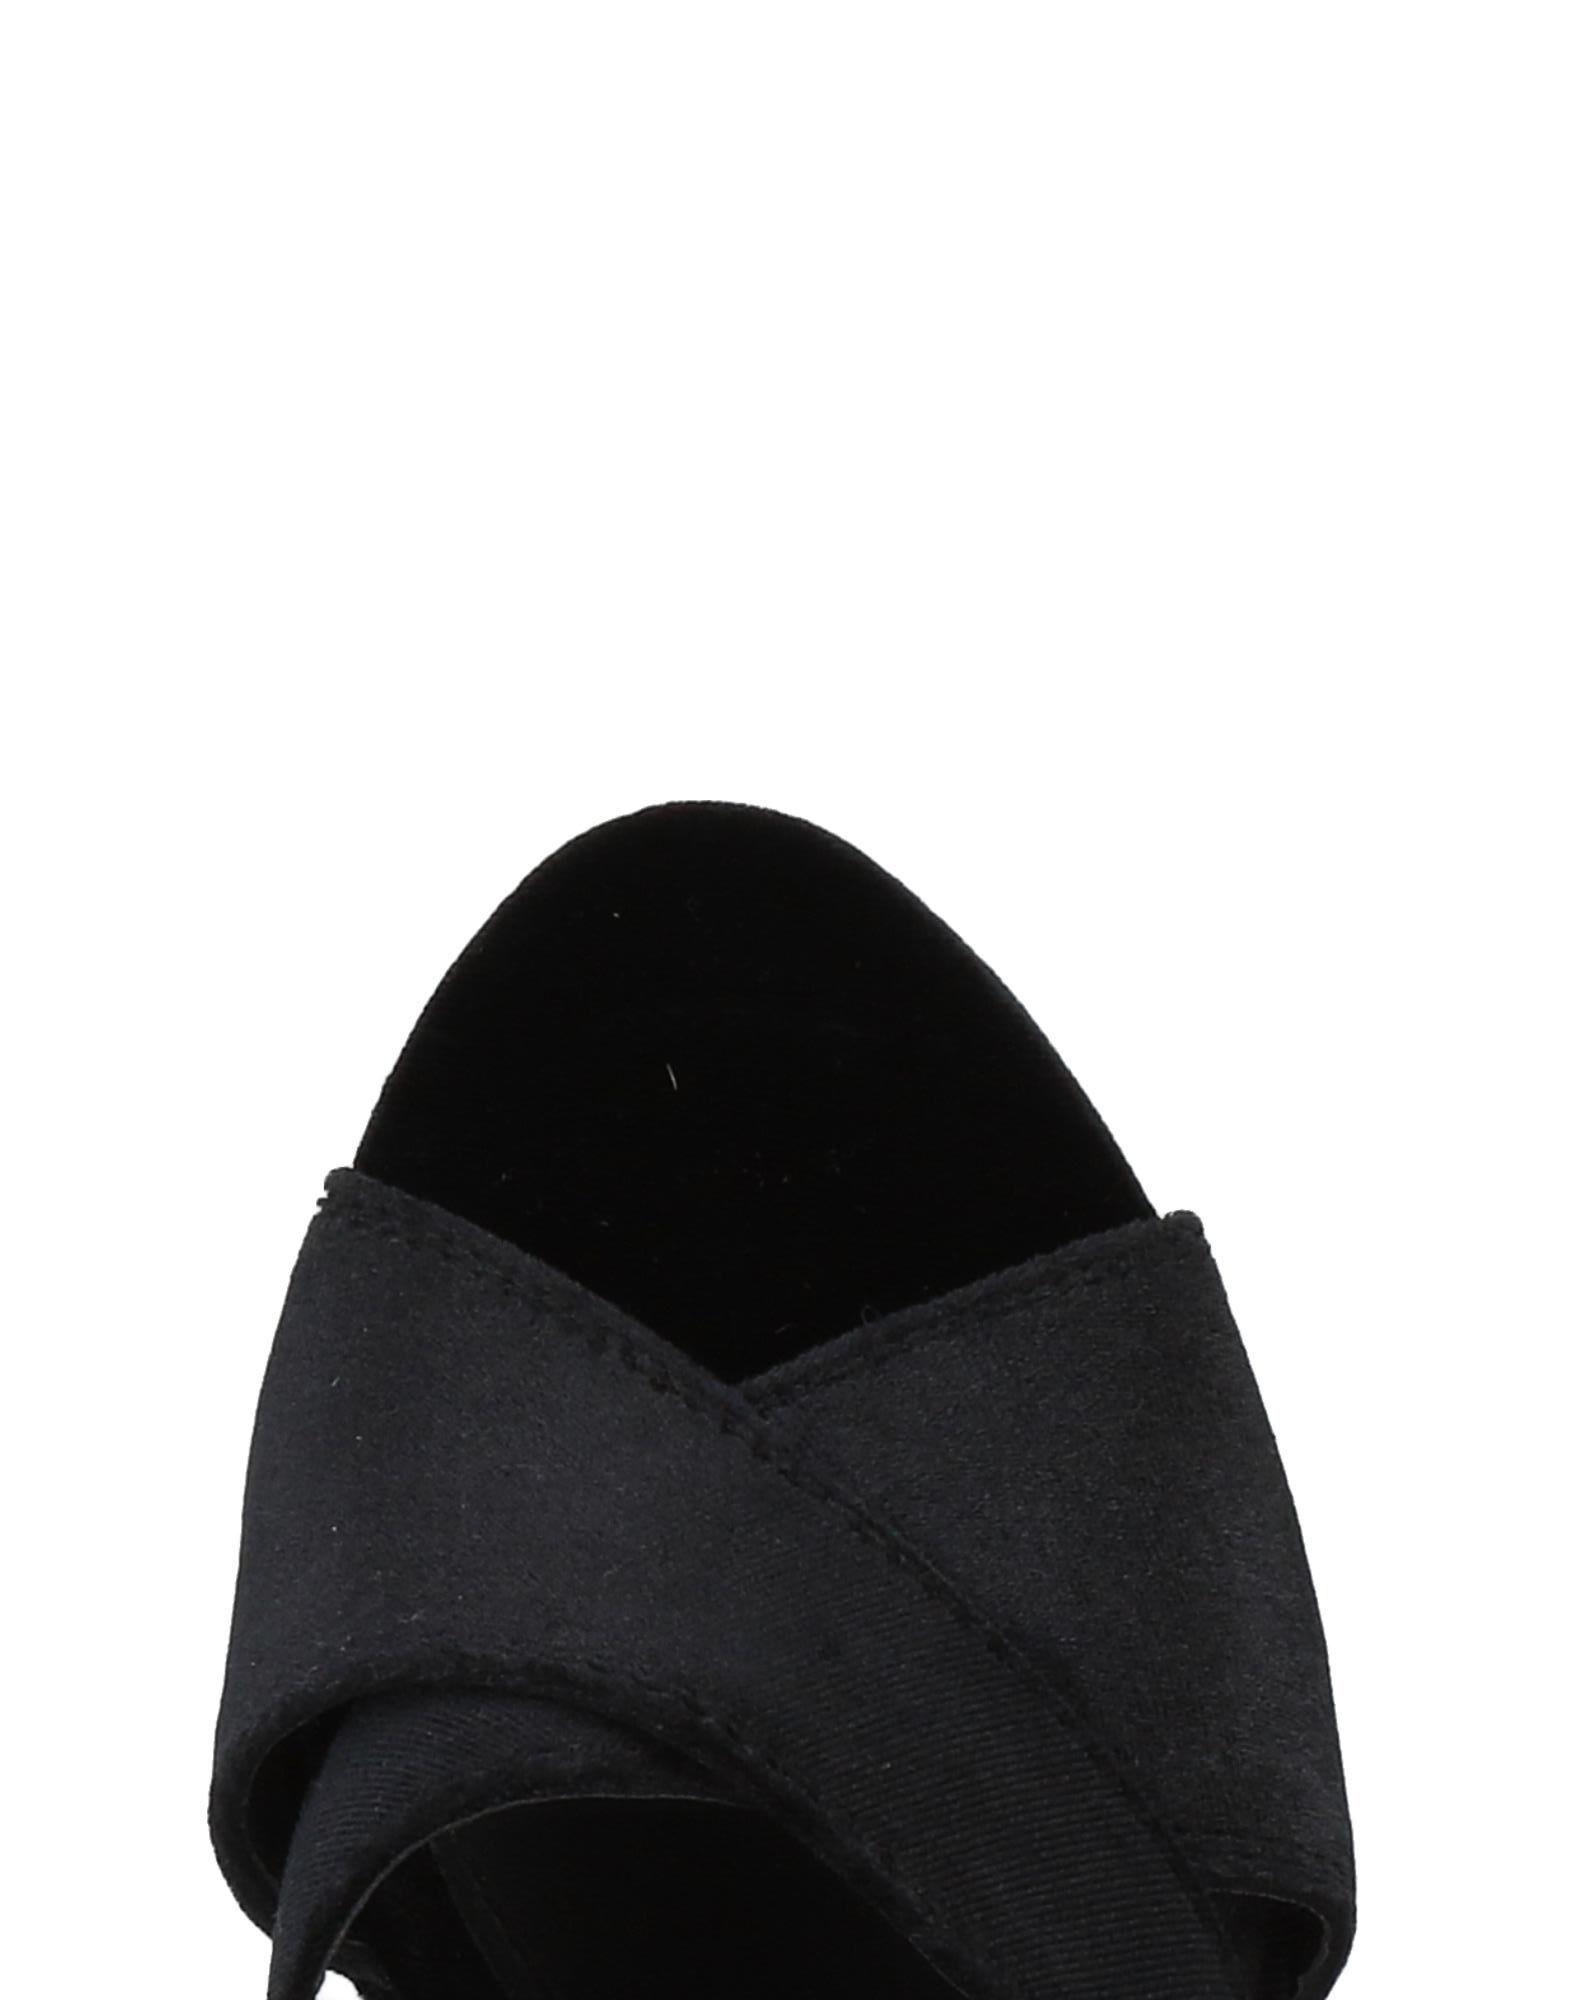 Gioseppo 11456259SP Sandalen Damen  11456259SP Gioseppo Gute Qualität beliebte Schuhe 69e9f4